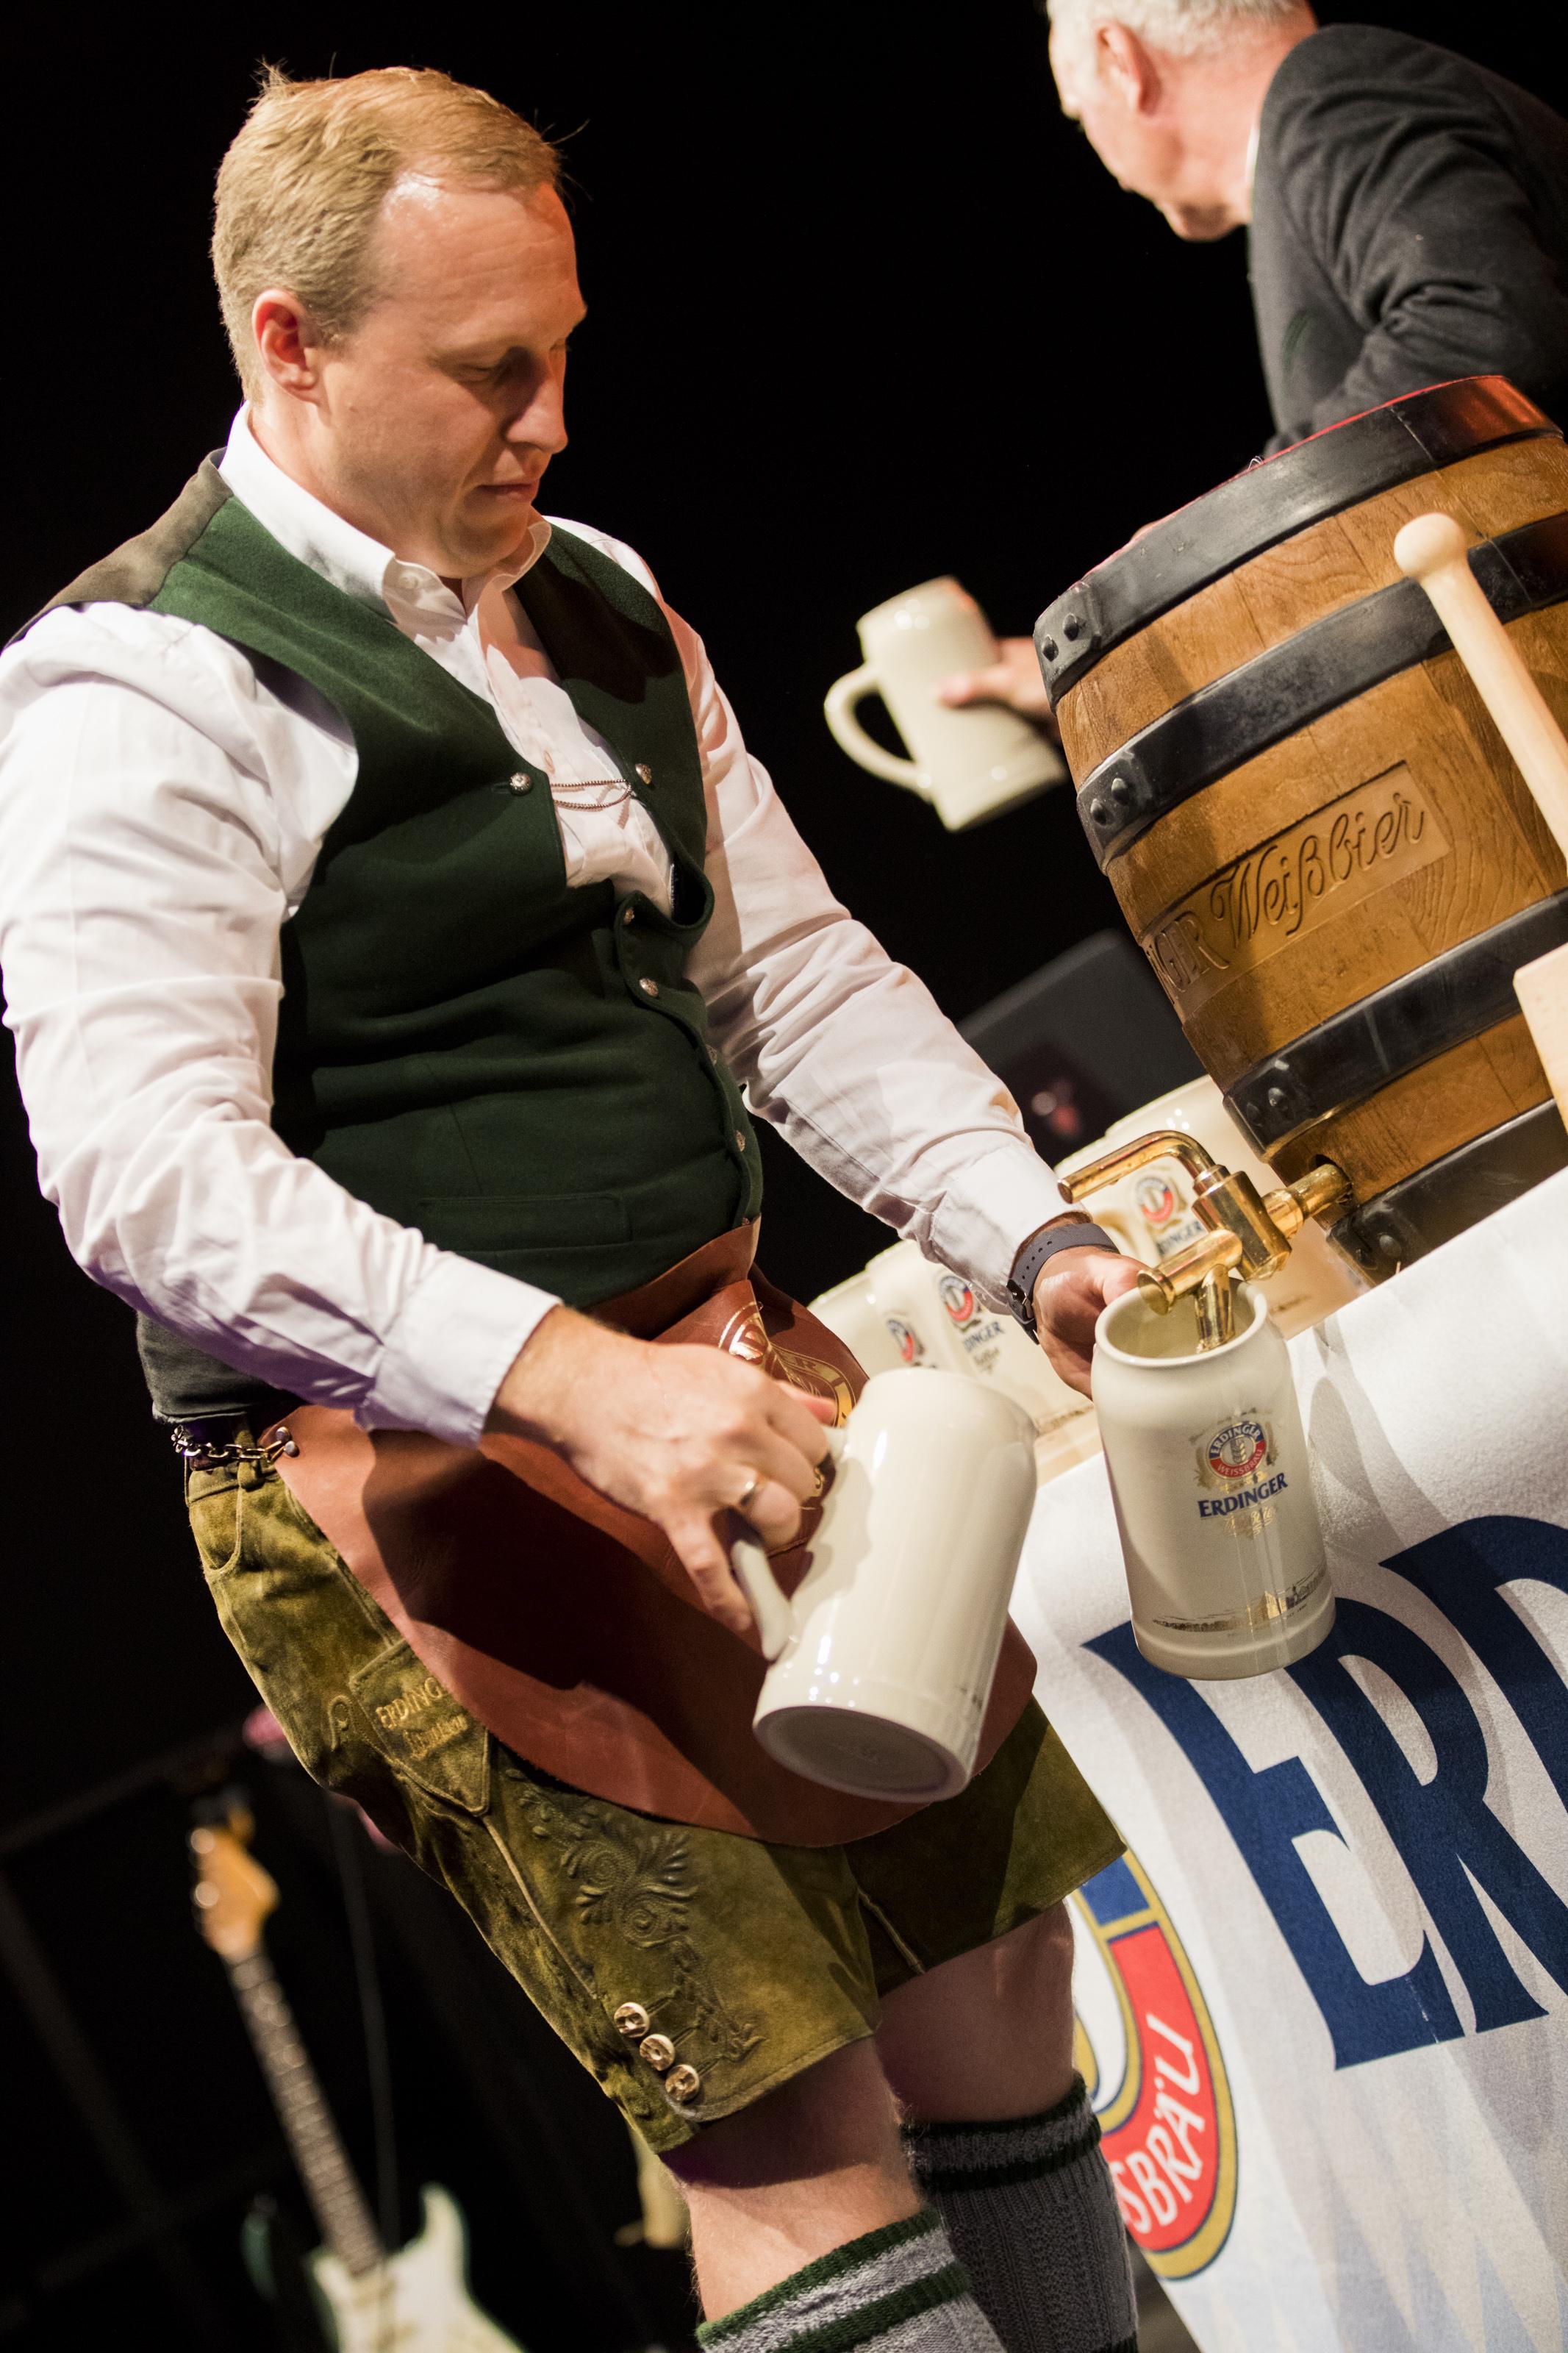 Opening Night at Erdinger Oktoberfest London - Queen Elizabeth Olympic Park